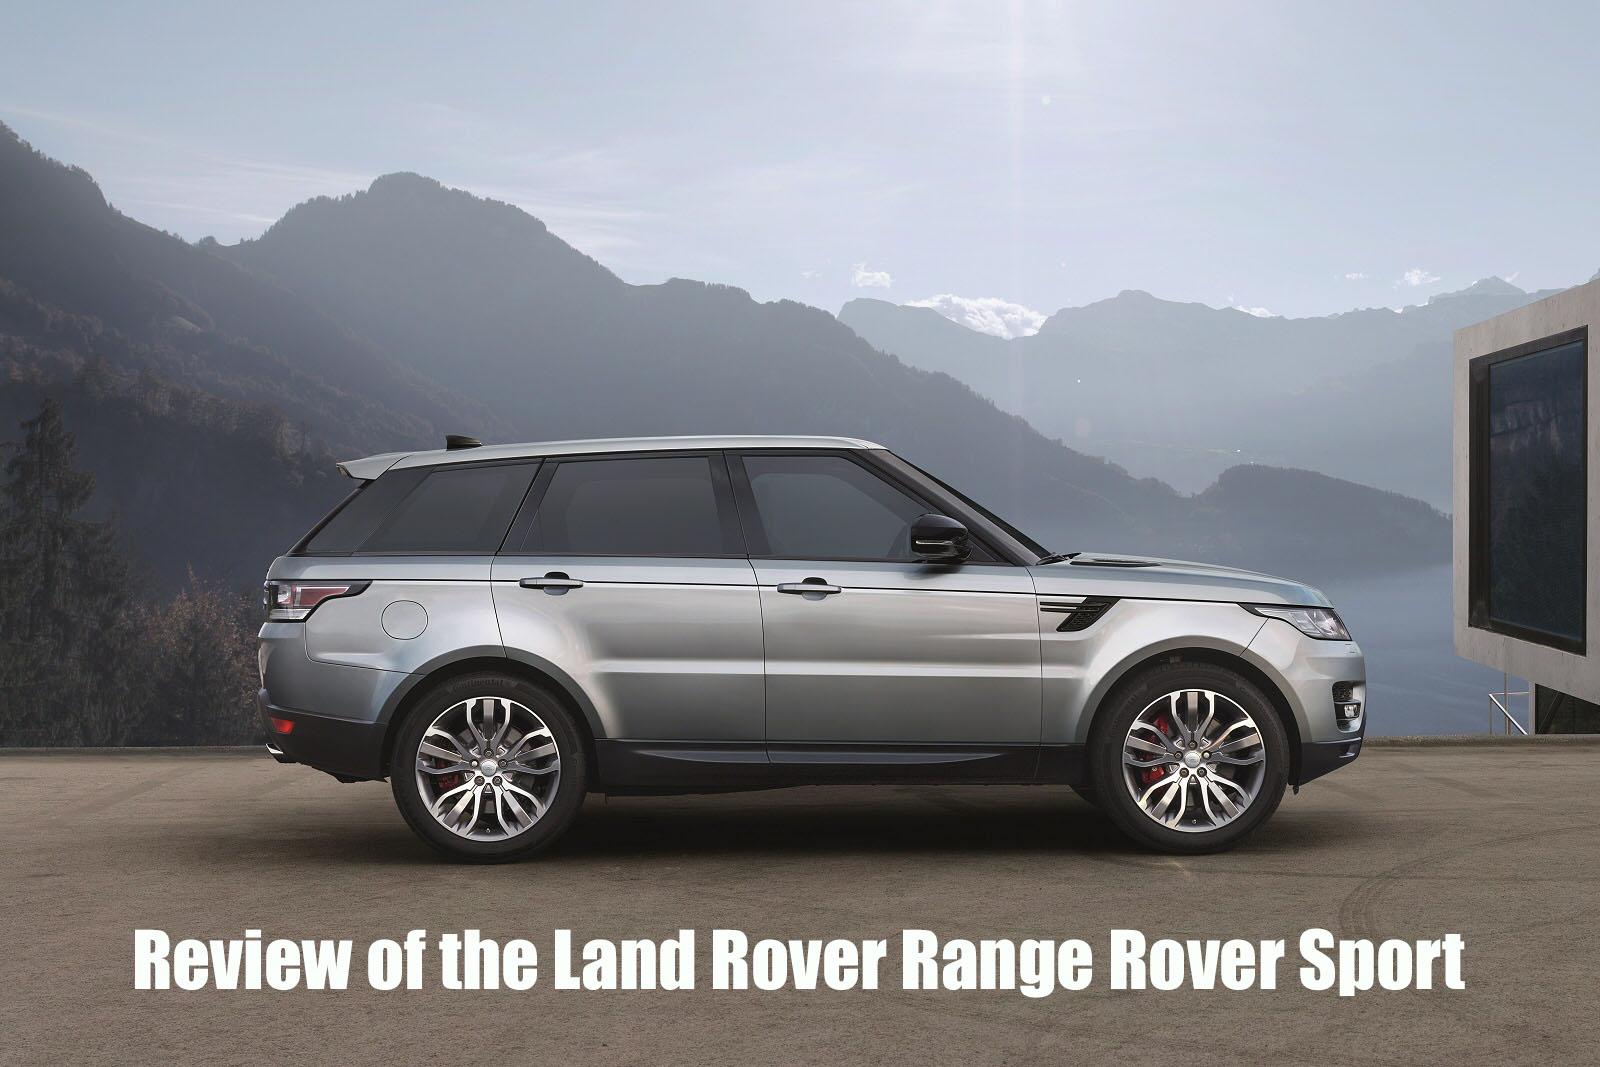 land rover range rover sport suv review osv. Black Bedroom Furniture Sets. Home Design Ideas